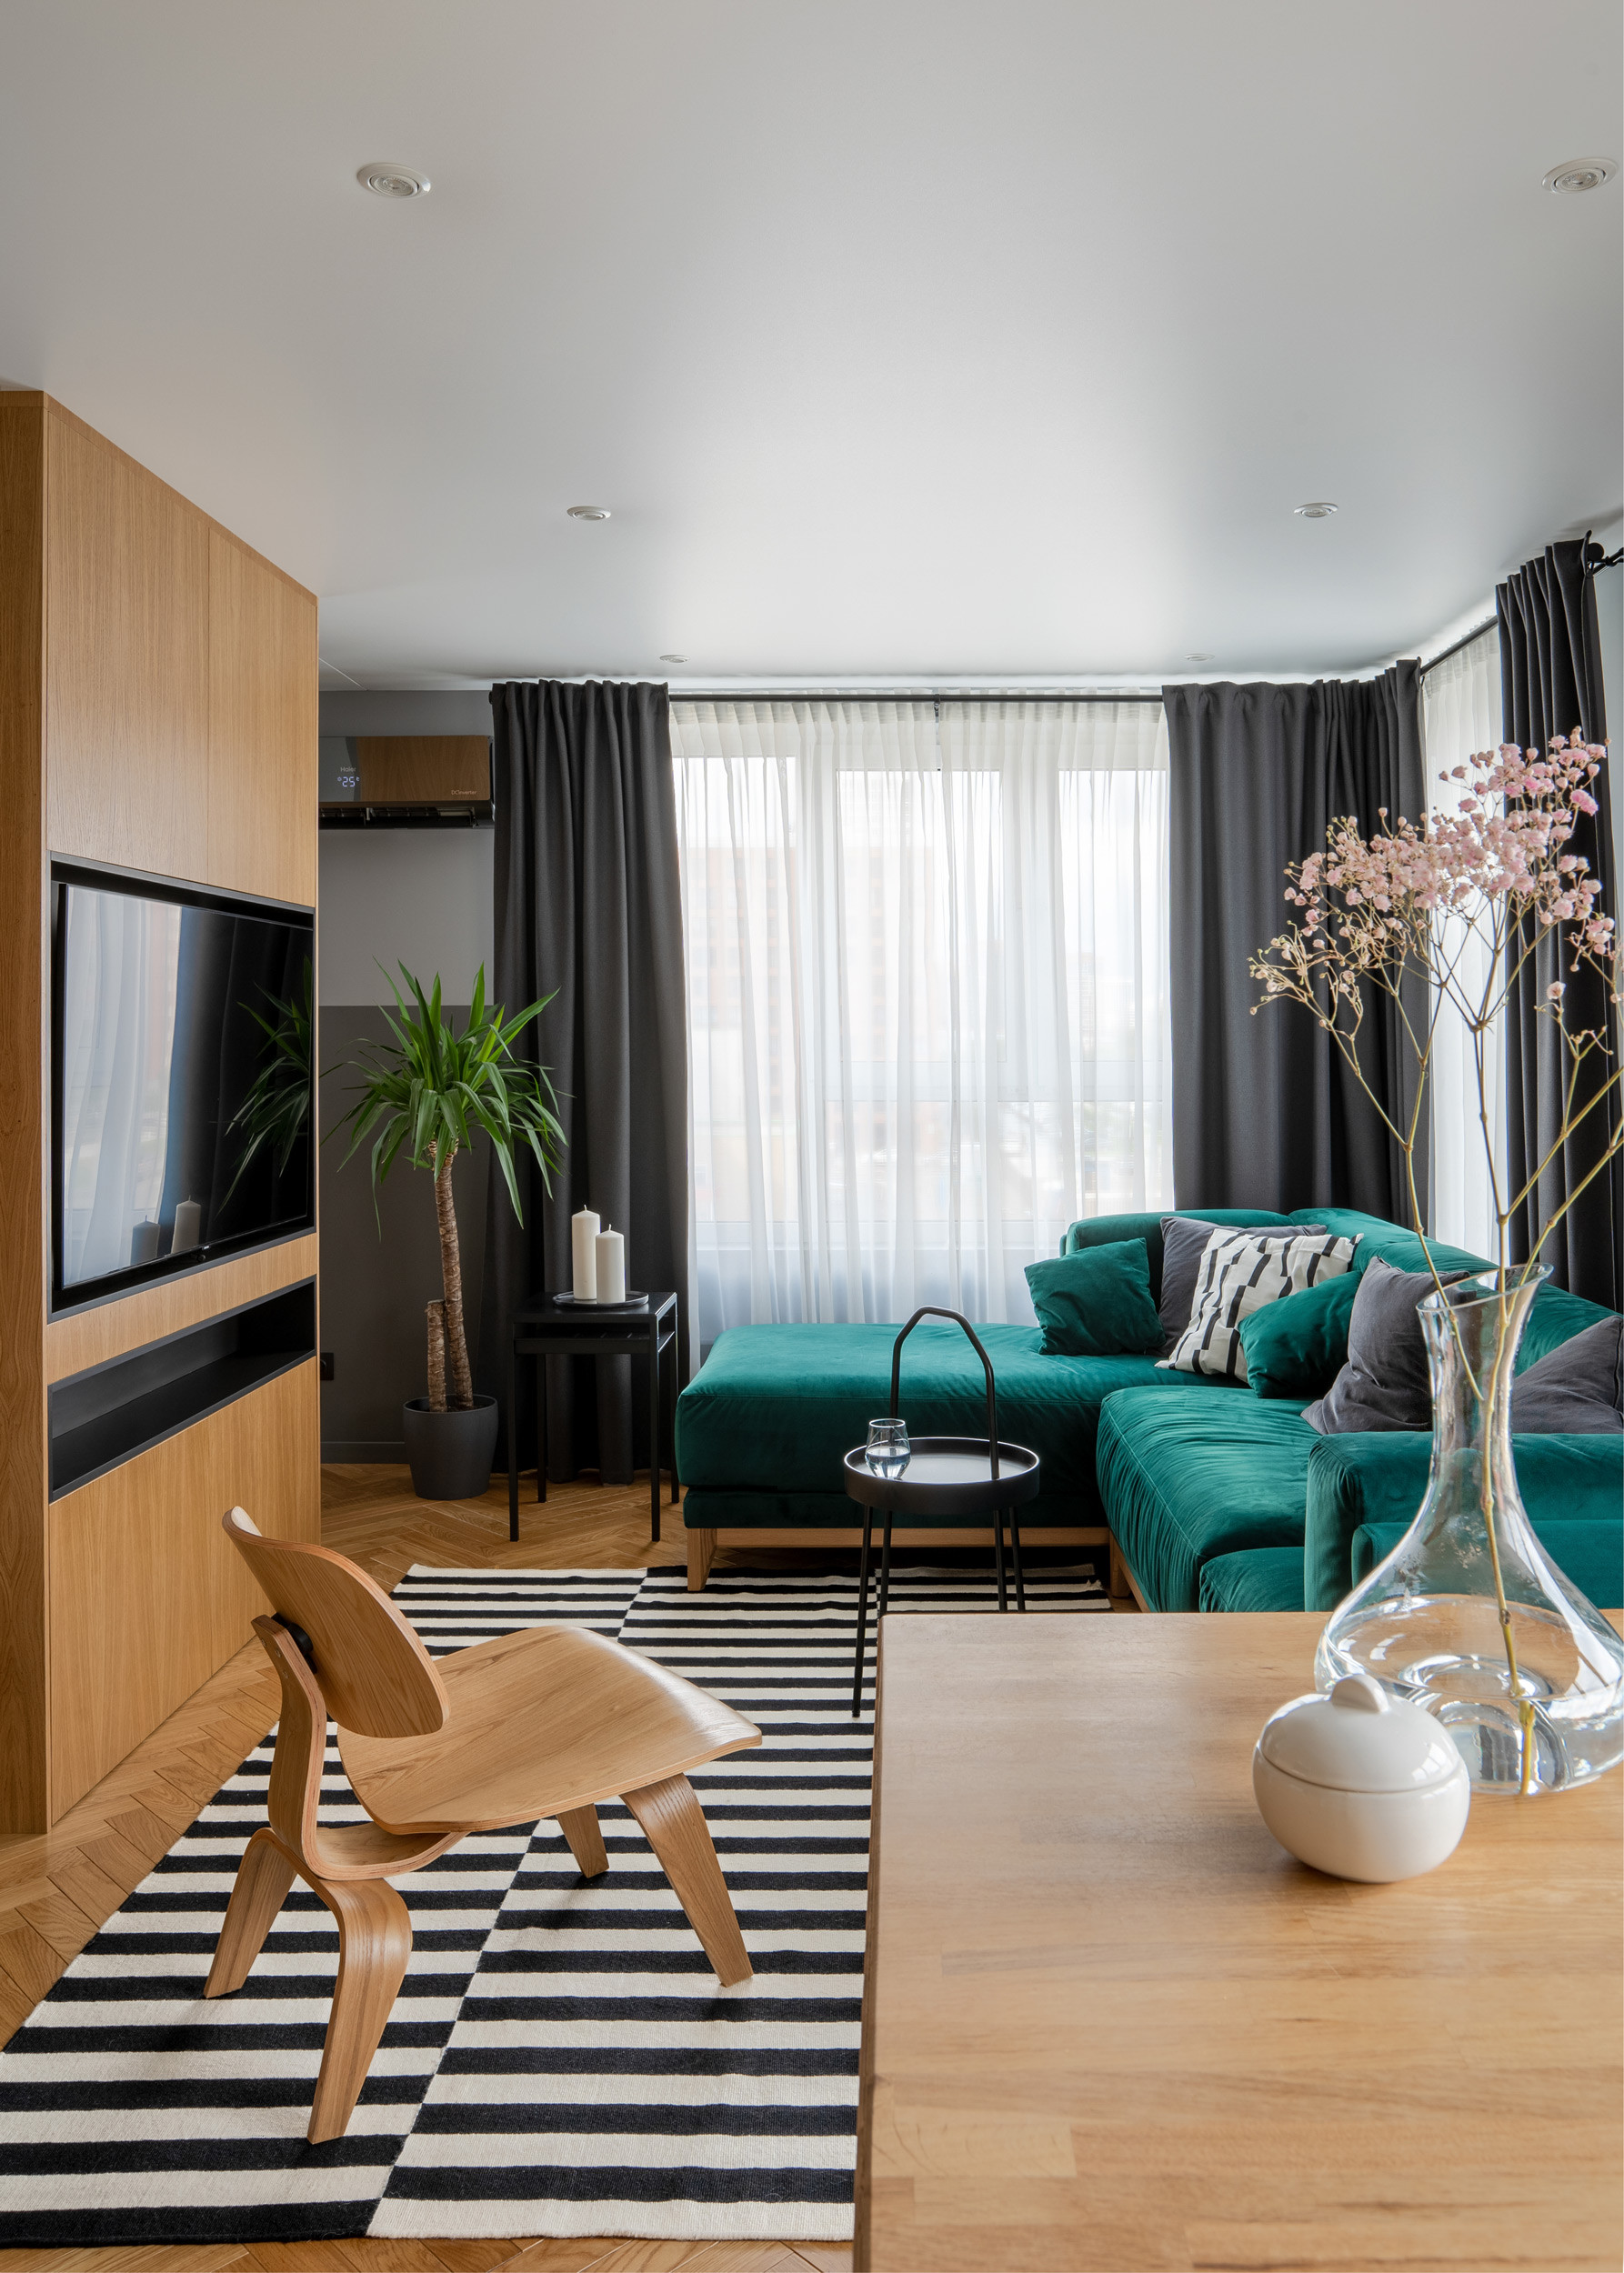 design interior SHUBOCHKINI architects SIA дизайн интерьераDSC07566-2HDR.jpg